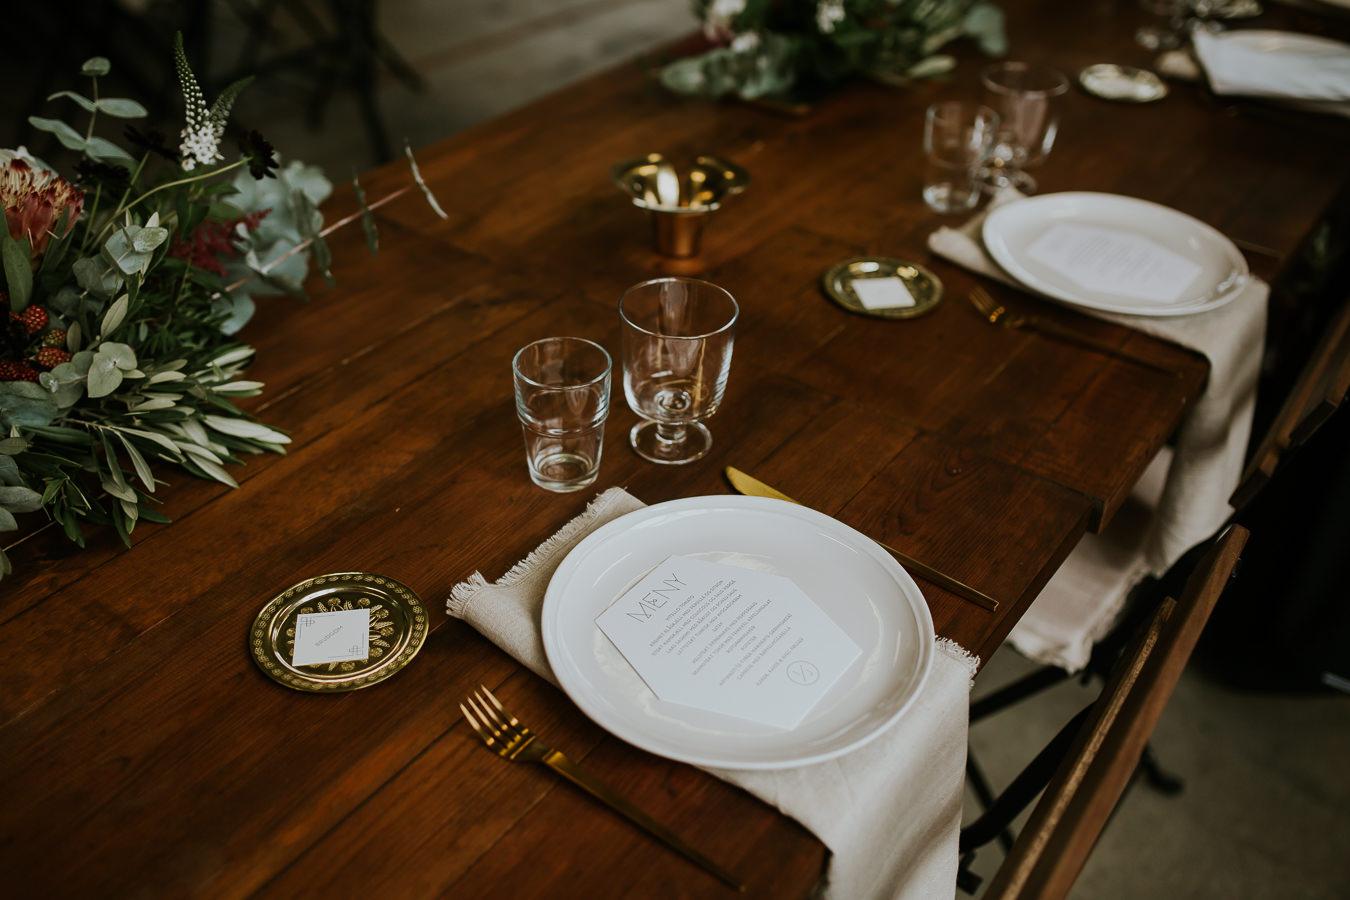 Bryllup-Lageret-Tofte-bryllupsfotograf-150.jpg